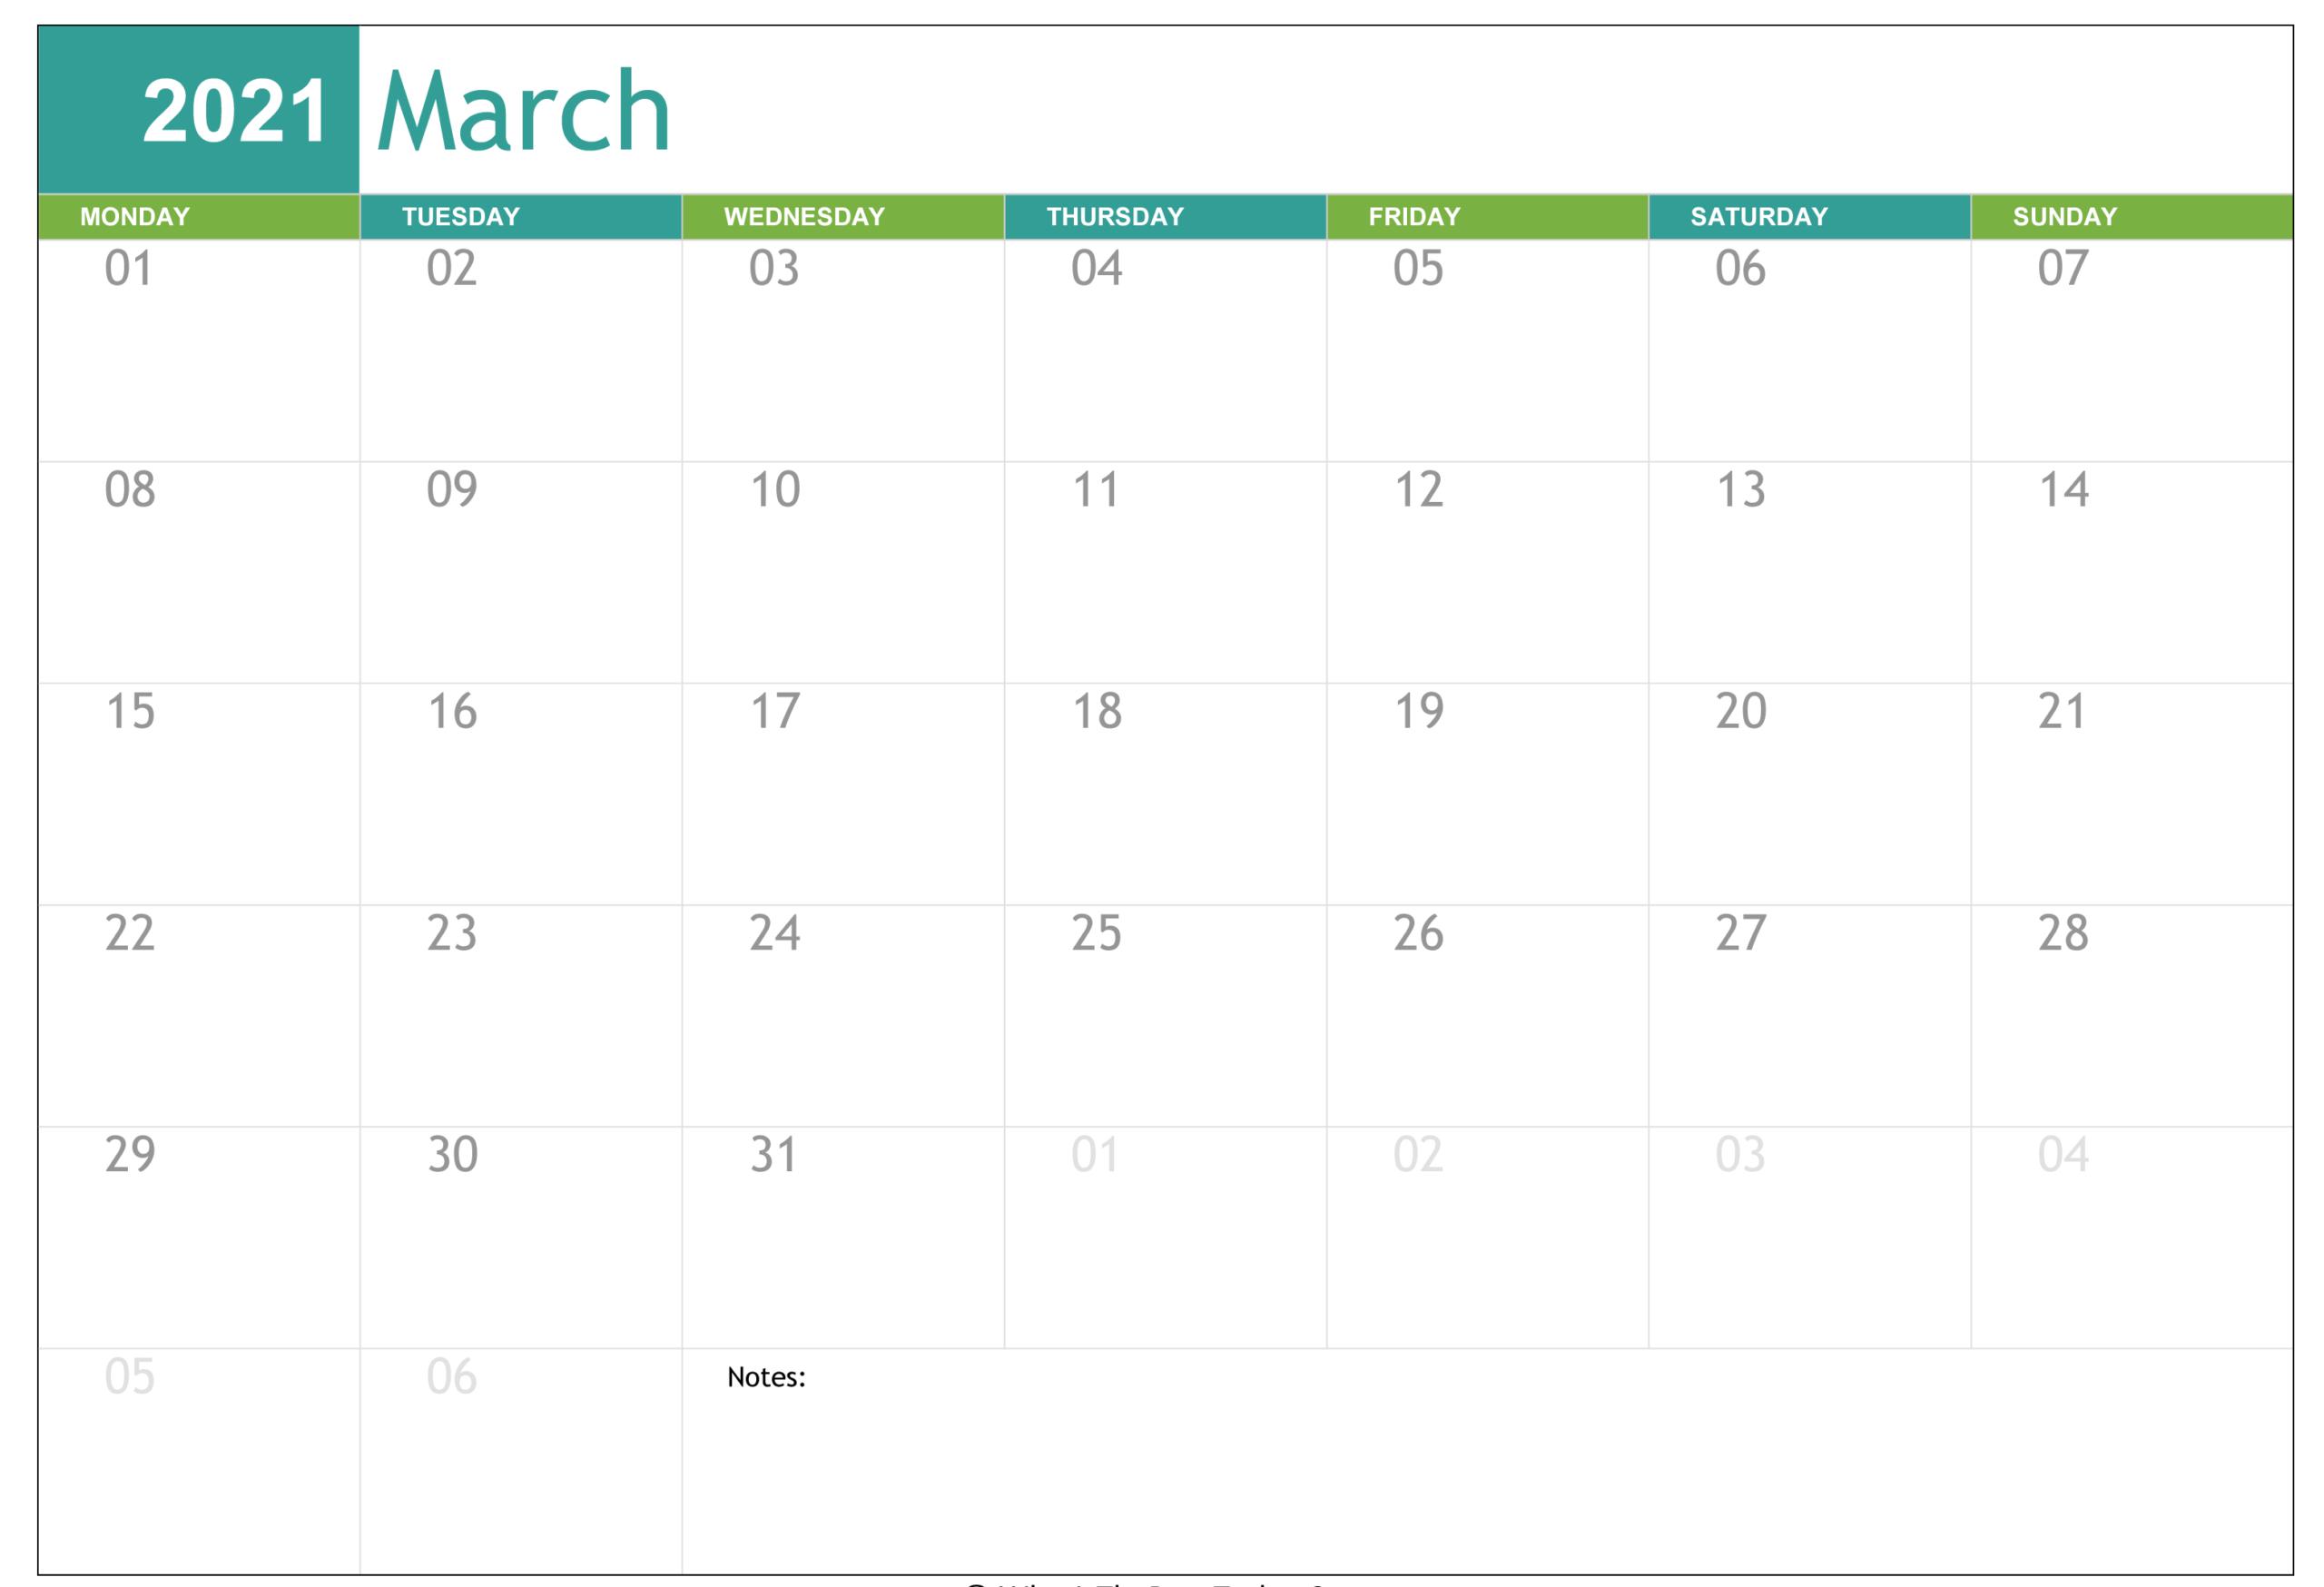 Print March 2021 Calendar Uk Bank & Public Holidays - Web-2021 Uk Calendar With Bank Holidays